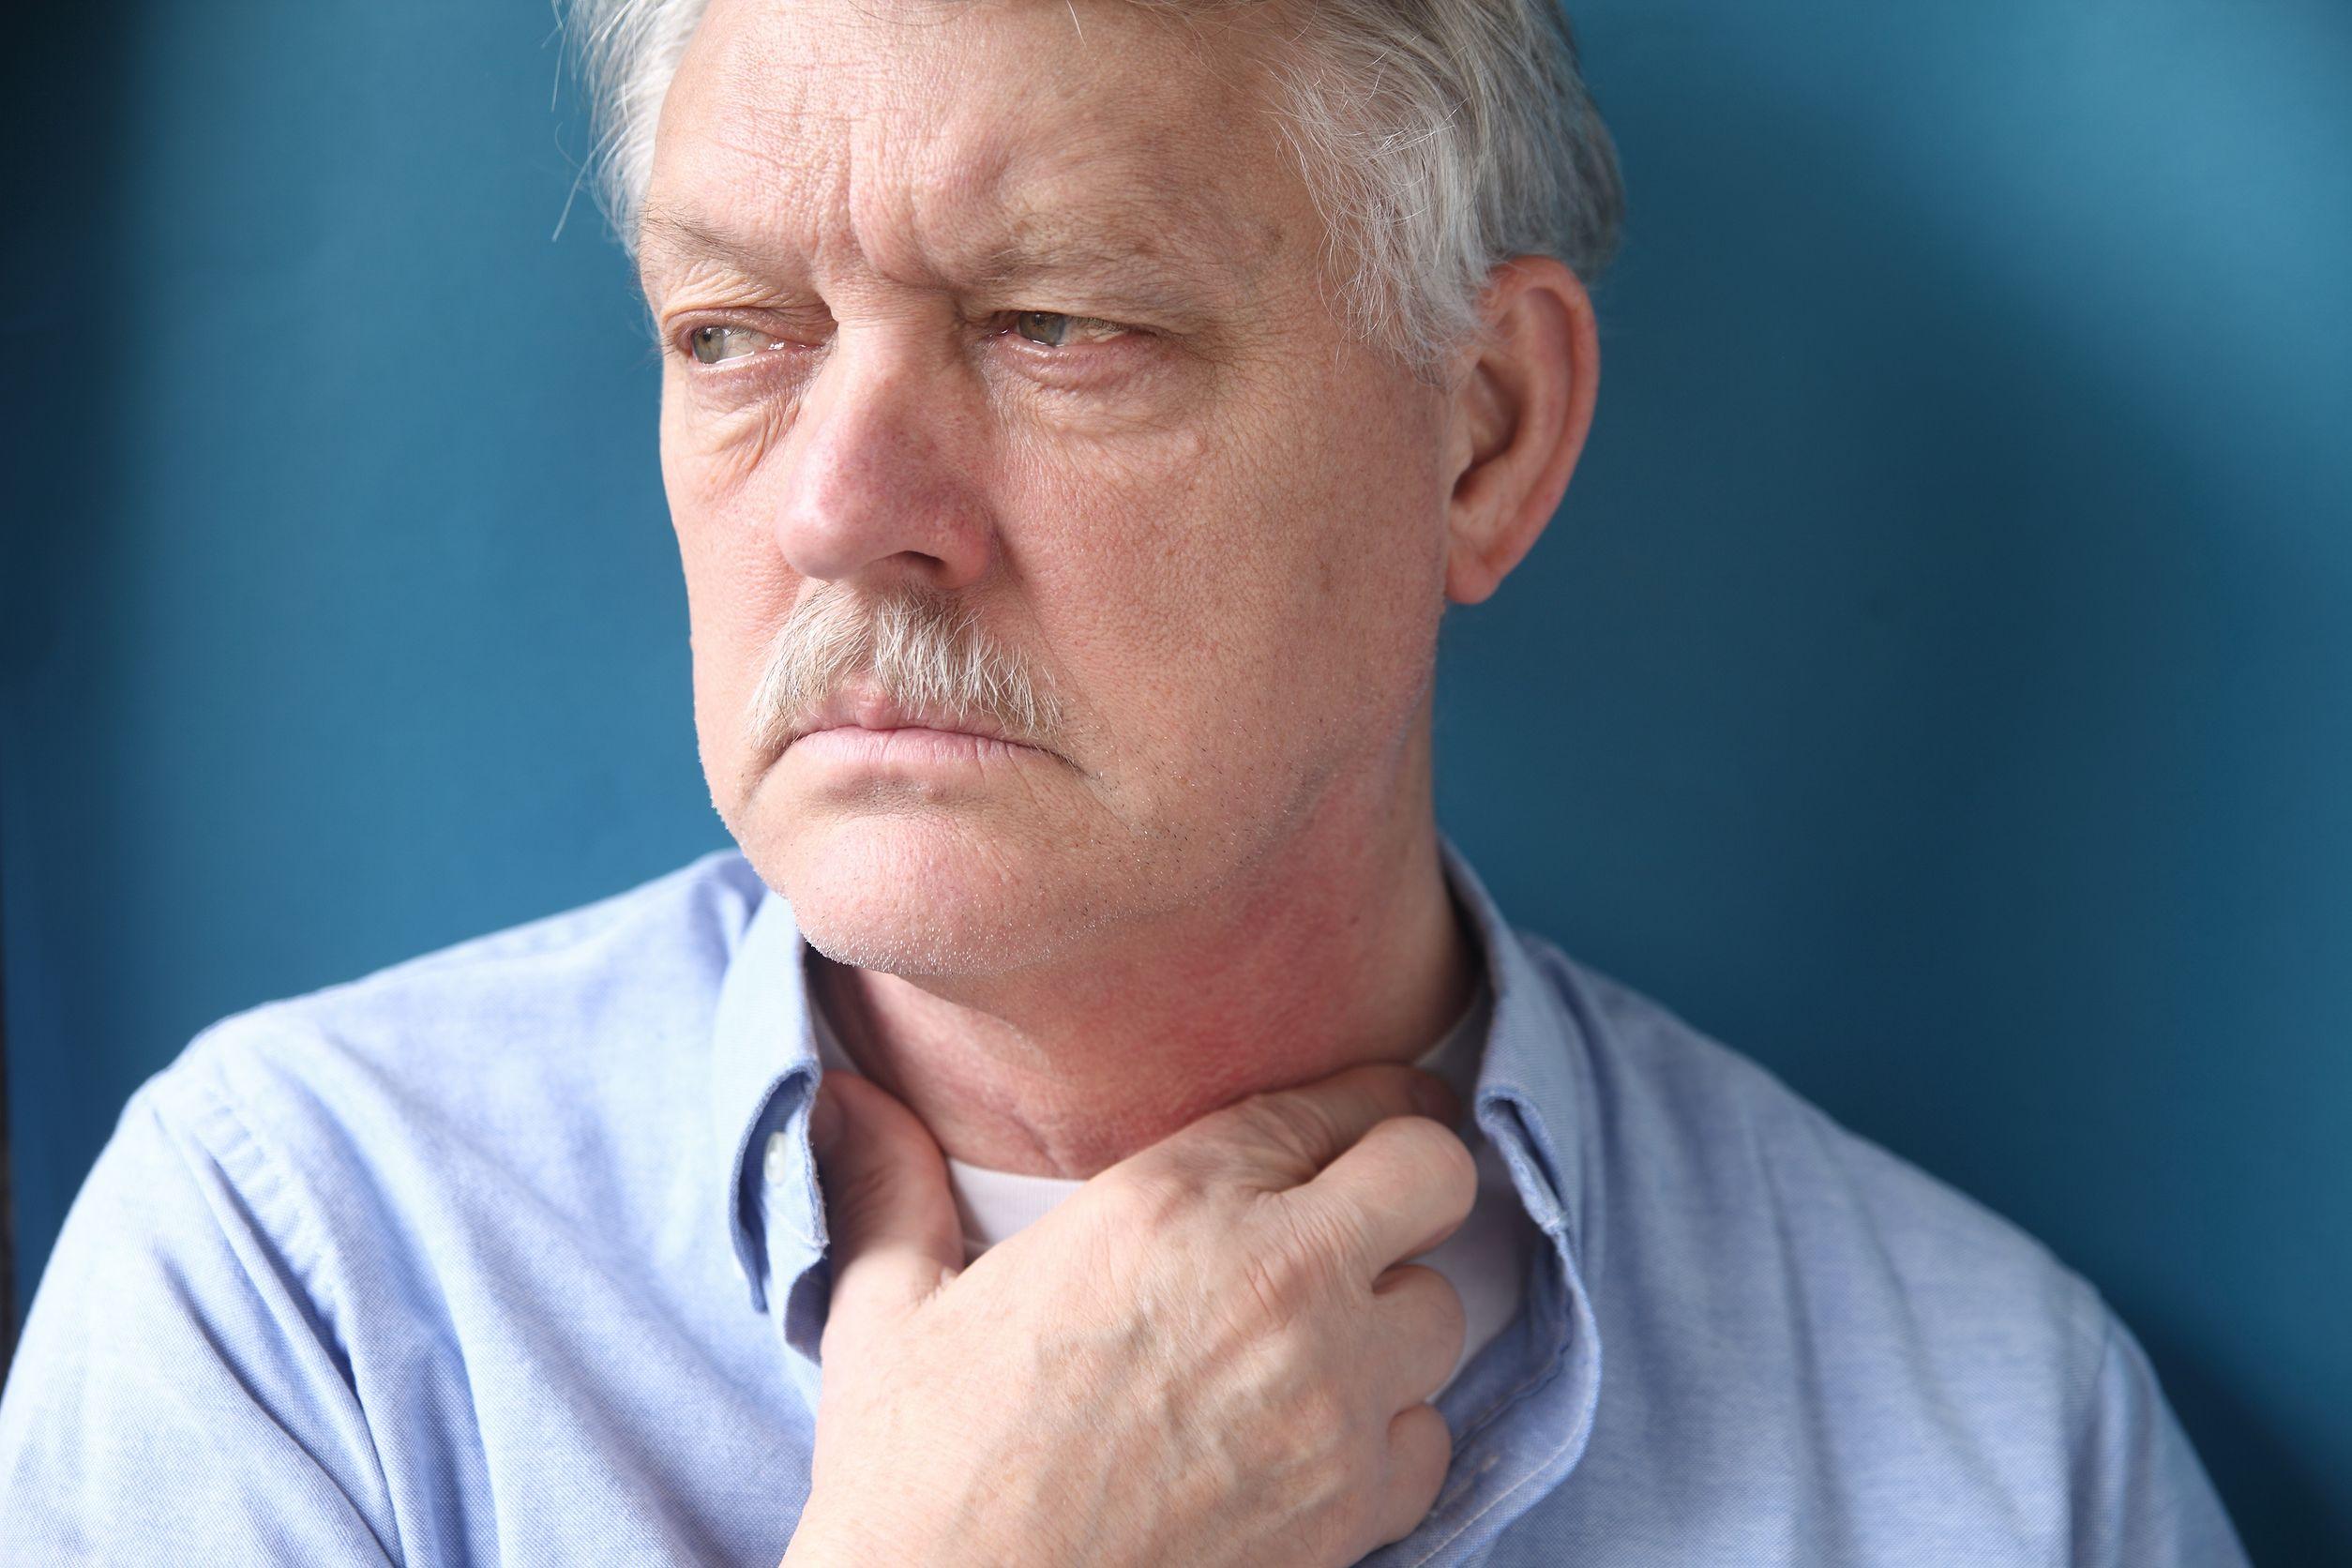 sad senior man with throat irritation